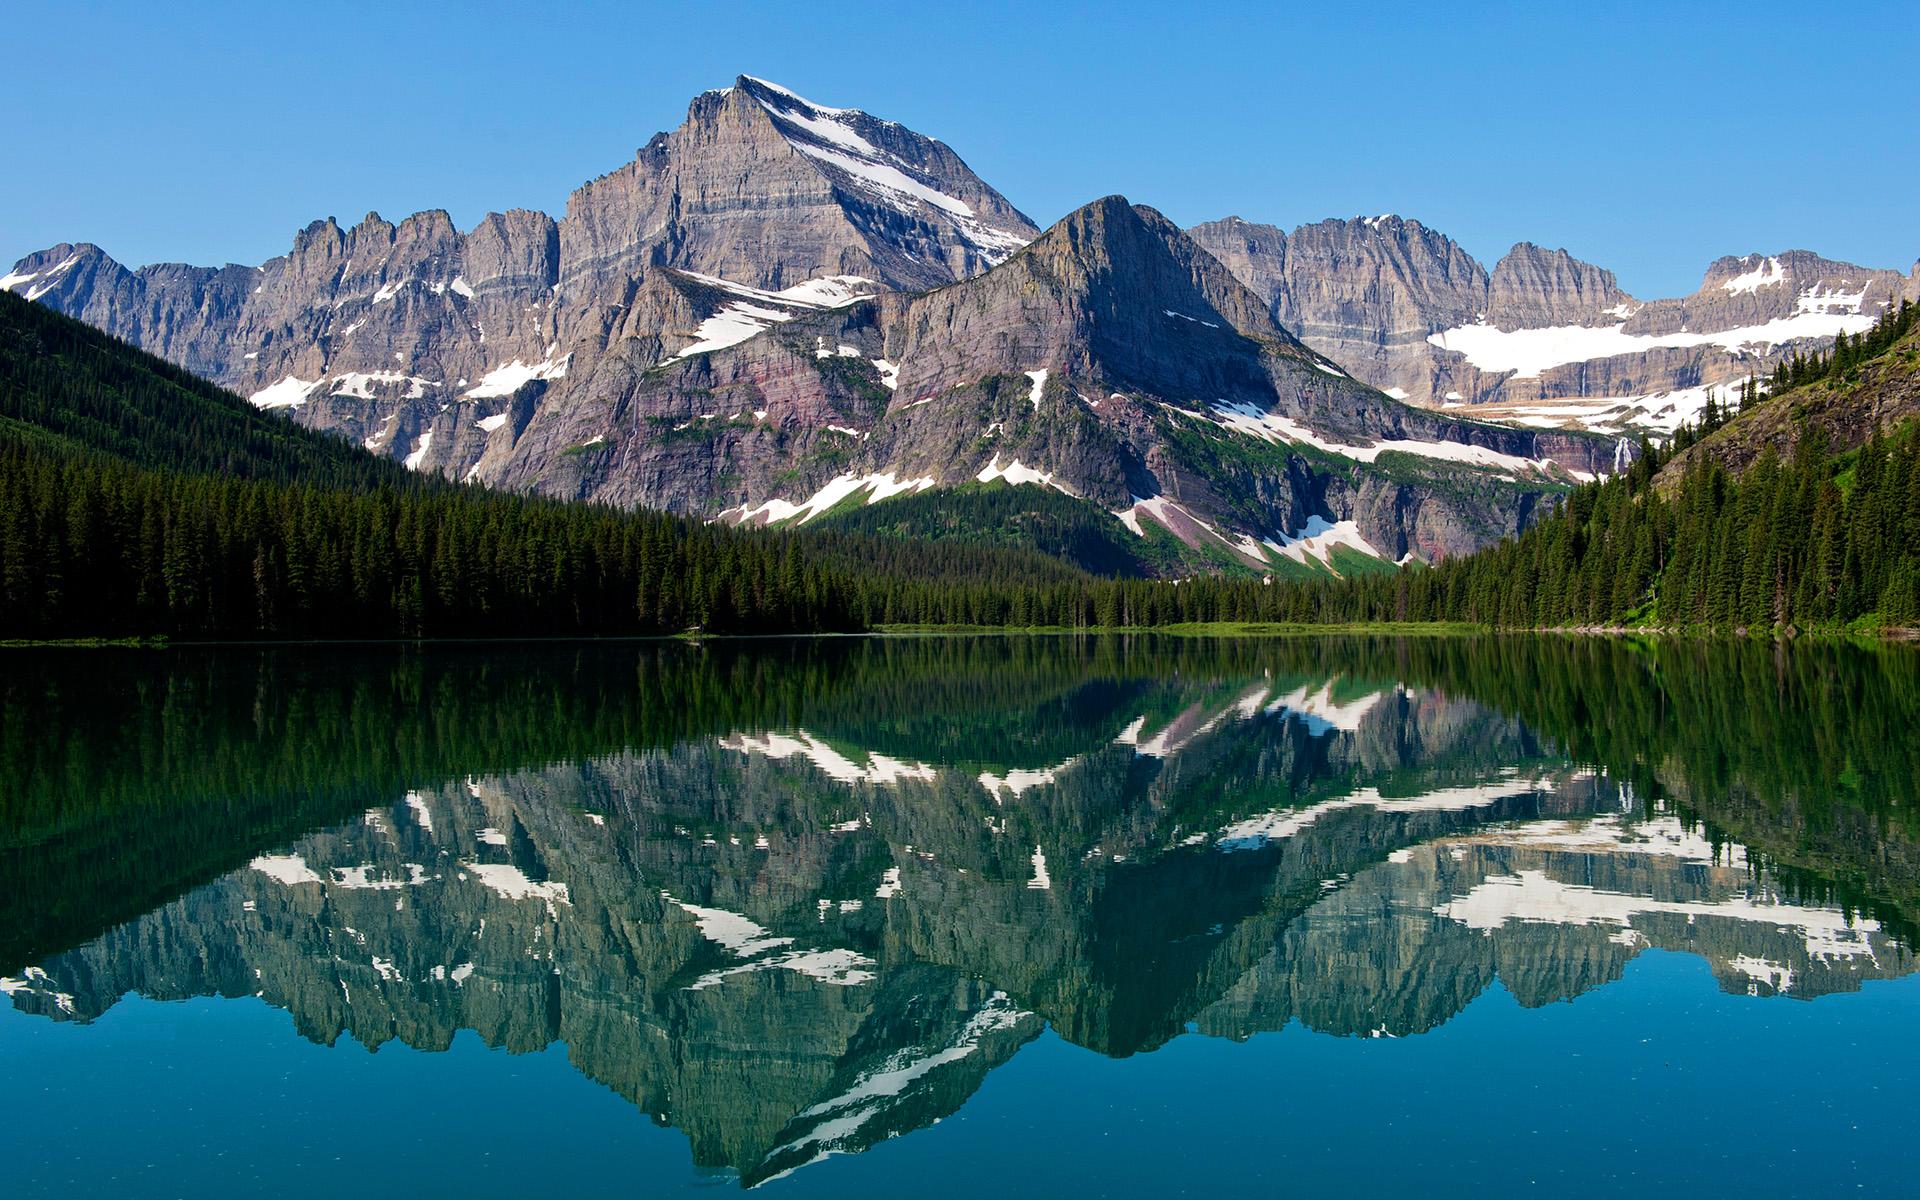 HD Wallpapers Mountain Lake Reflections